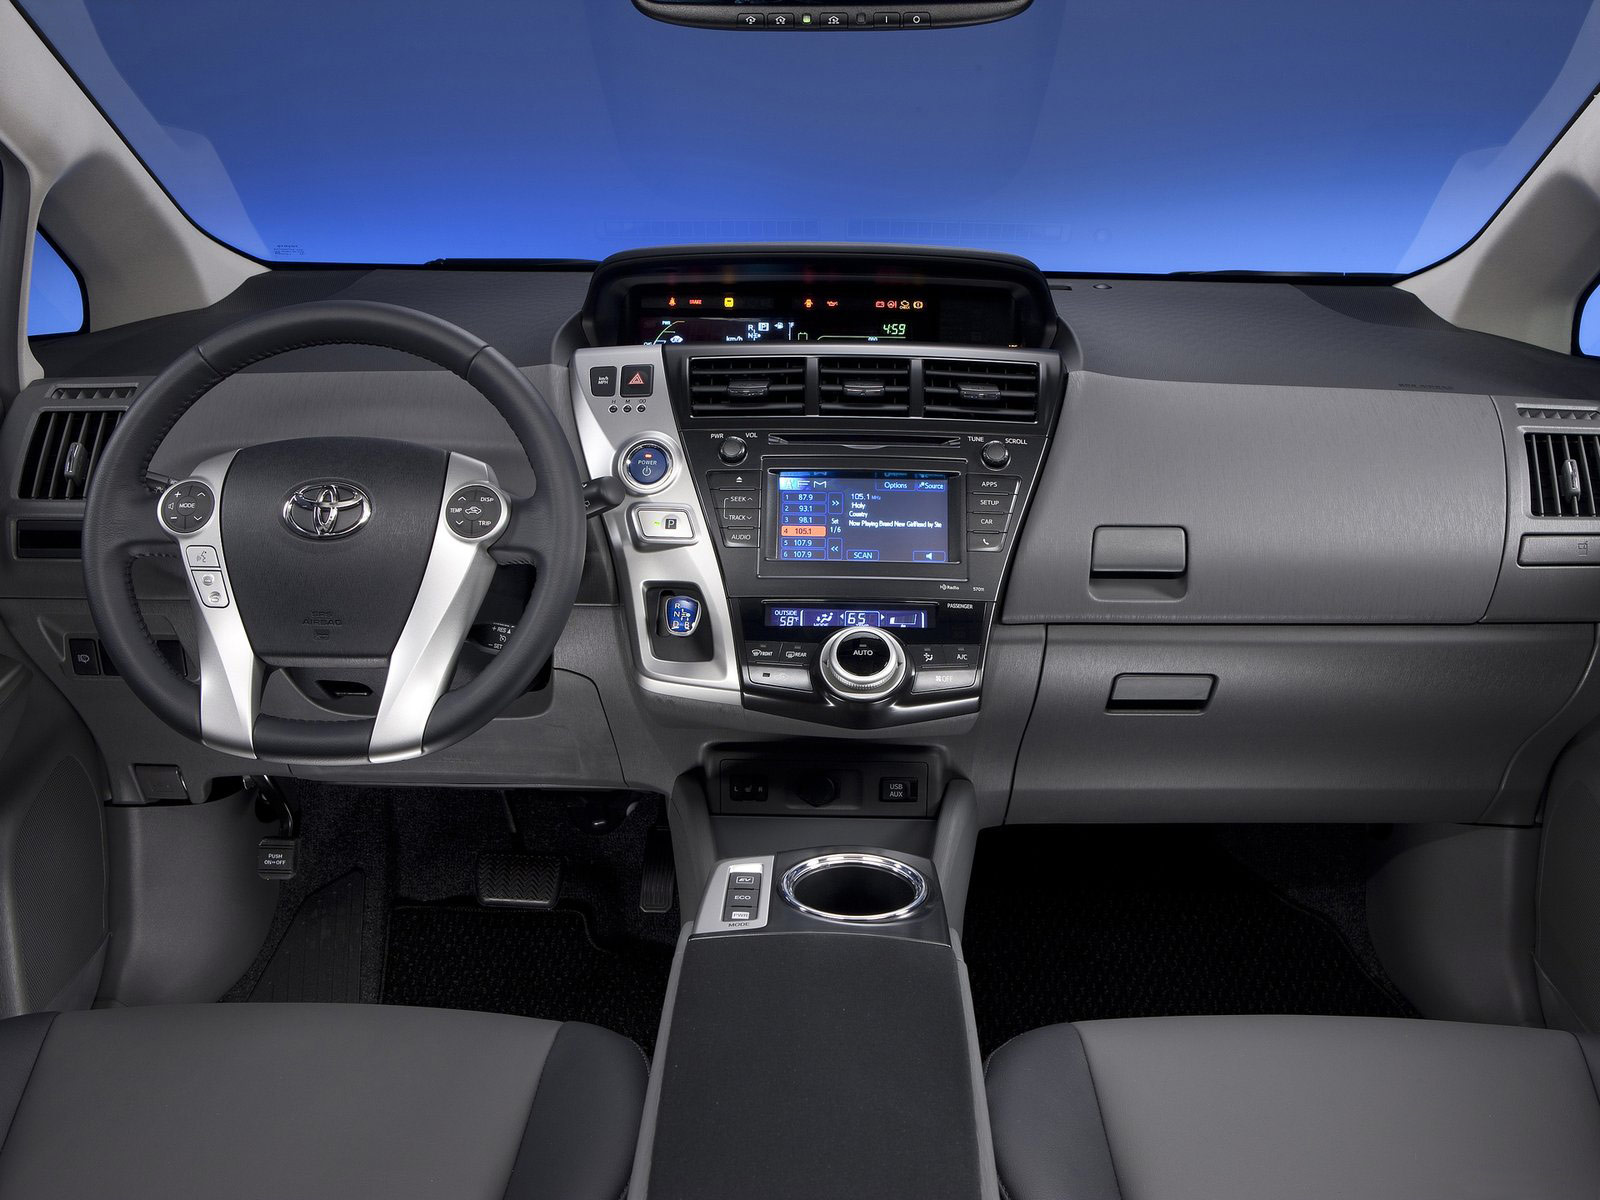 Japanese Car Photos 2012 Toyota Prius V Interior With